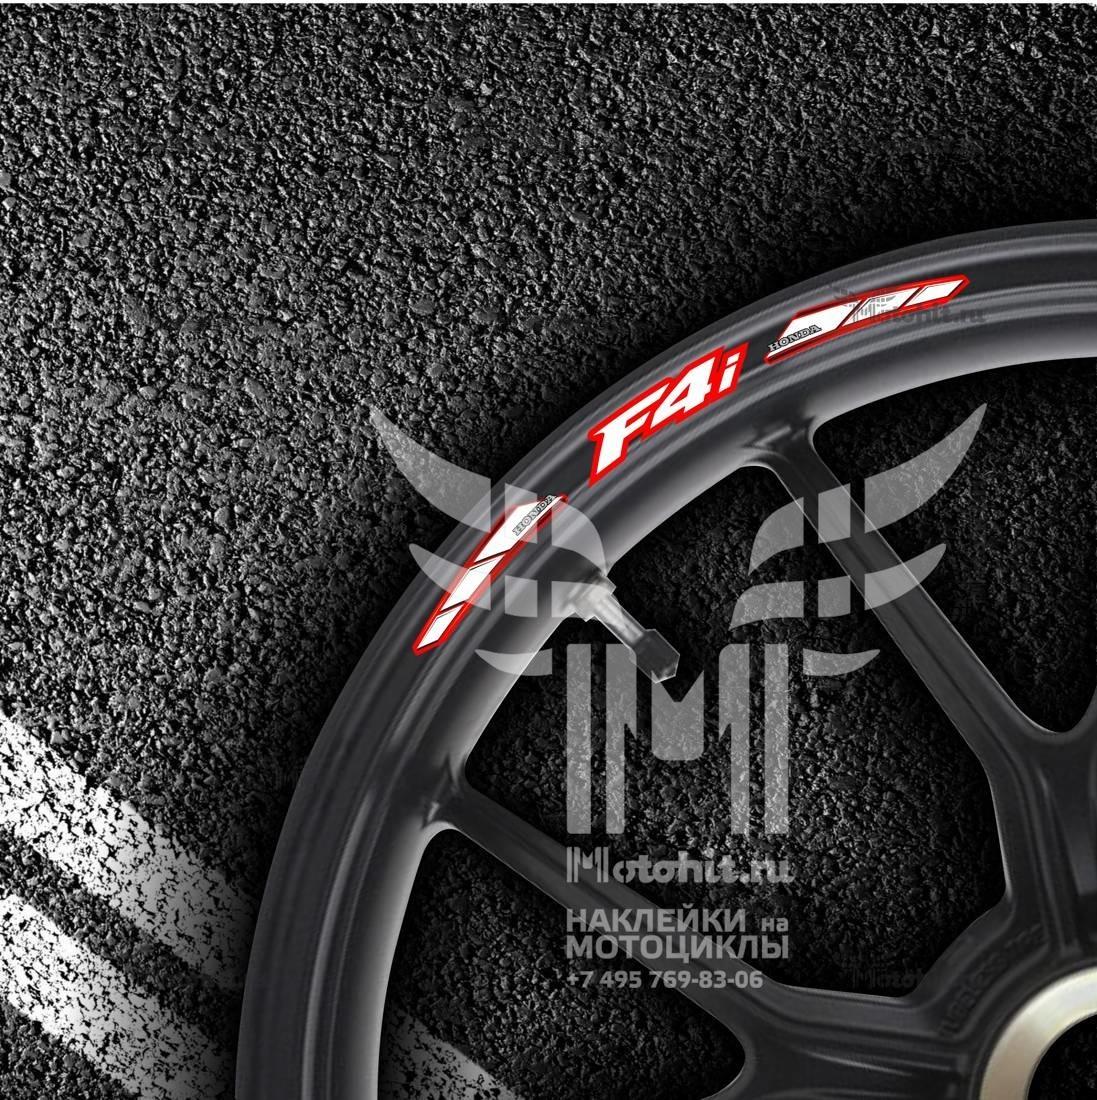 Комплект наклеек на обод колеса мотоцикла HONDA F4i